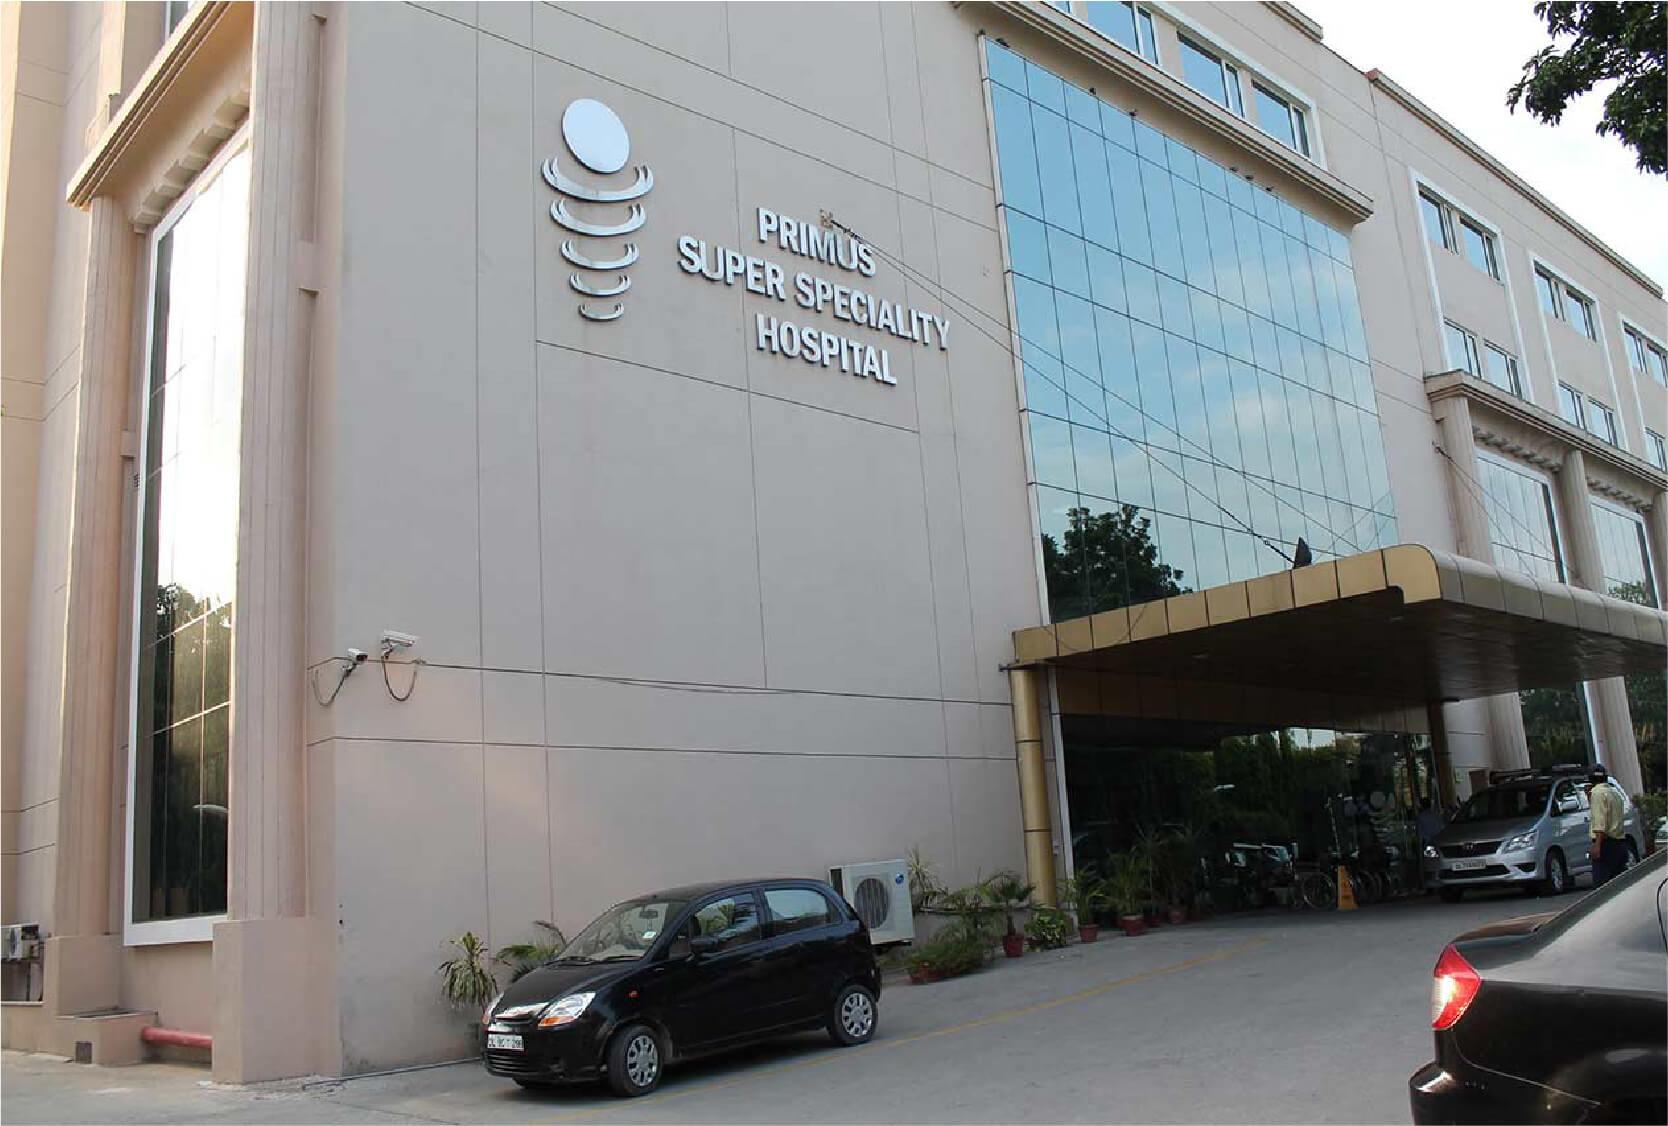 Primus Super Speciality Hospital - Chanakyapuri - Delhi Photo1